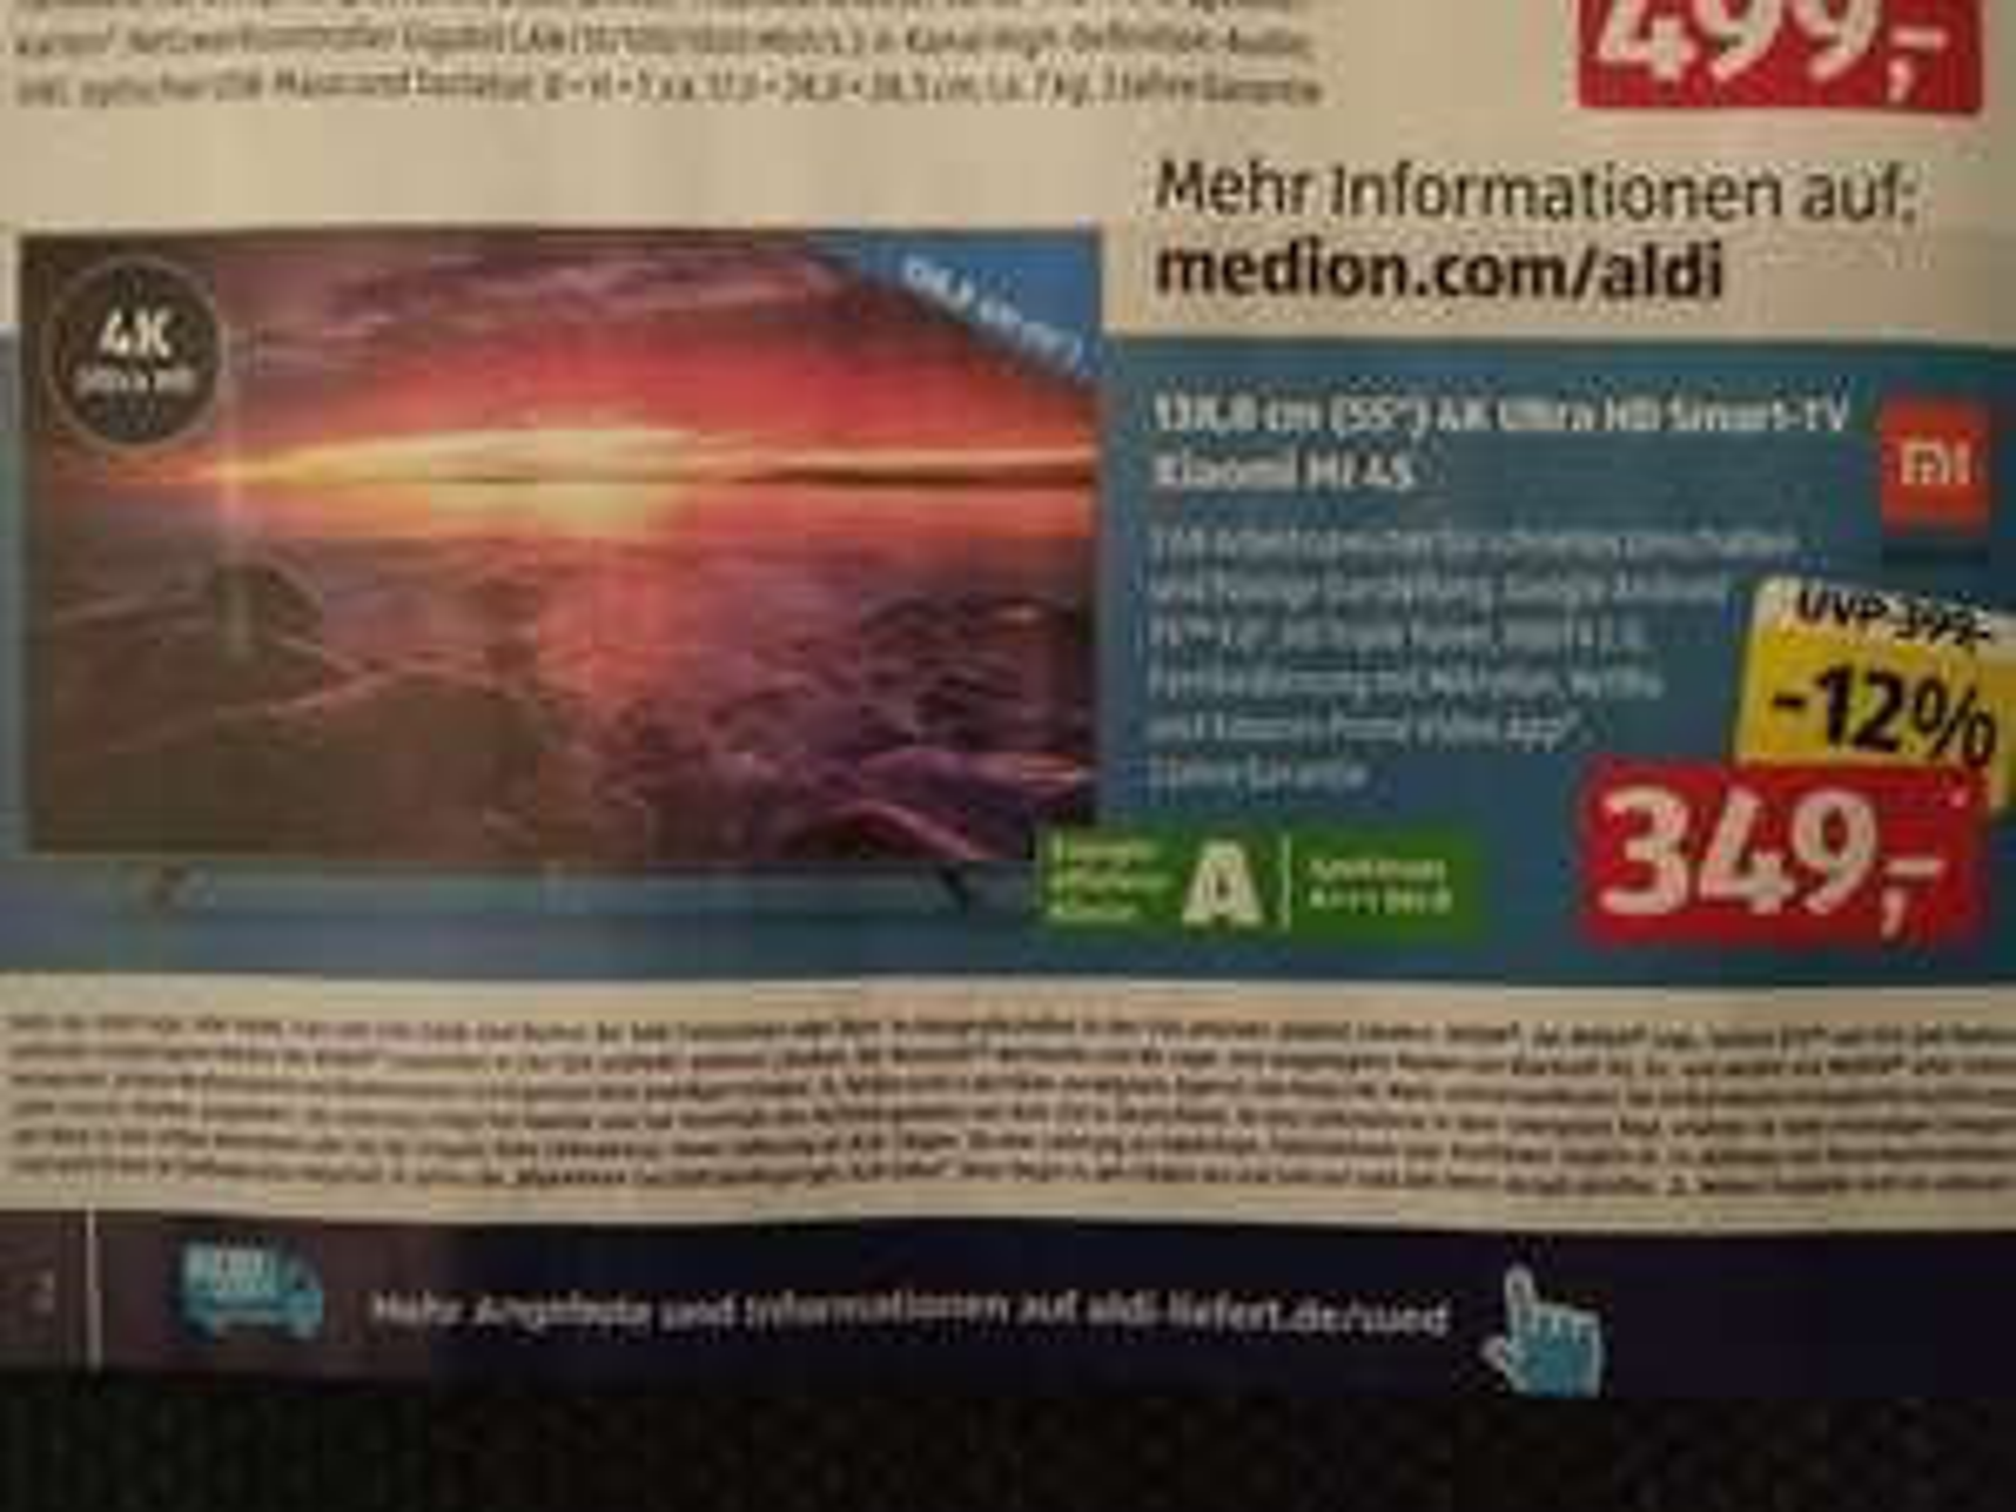 [Aldi Süd offline] Xiaomi Mi 4S TV 55 Zoll 4k Ultra HD